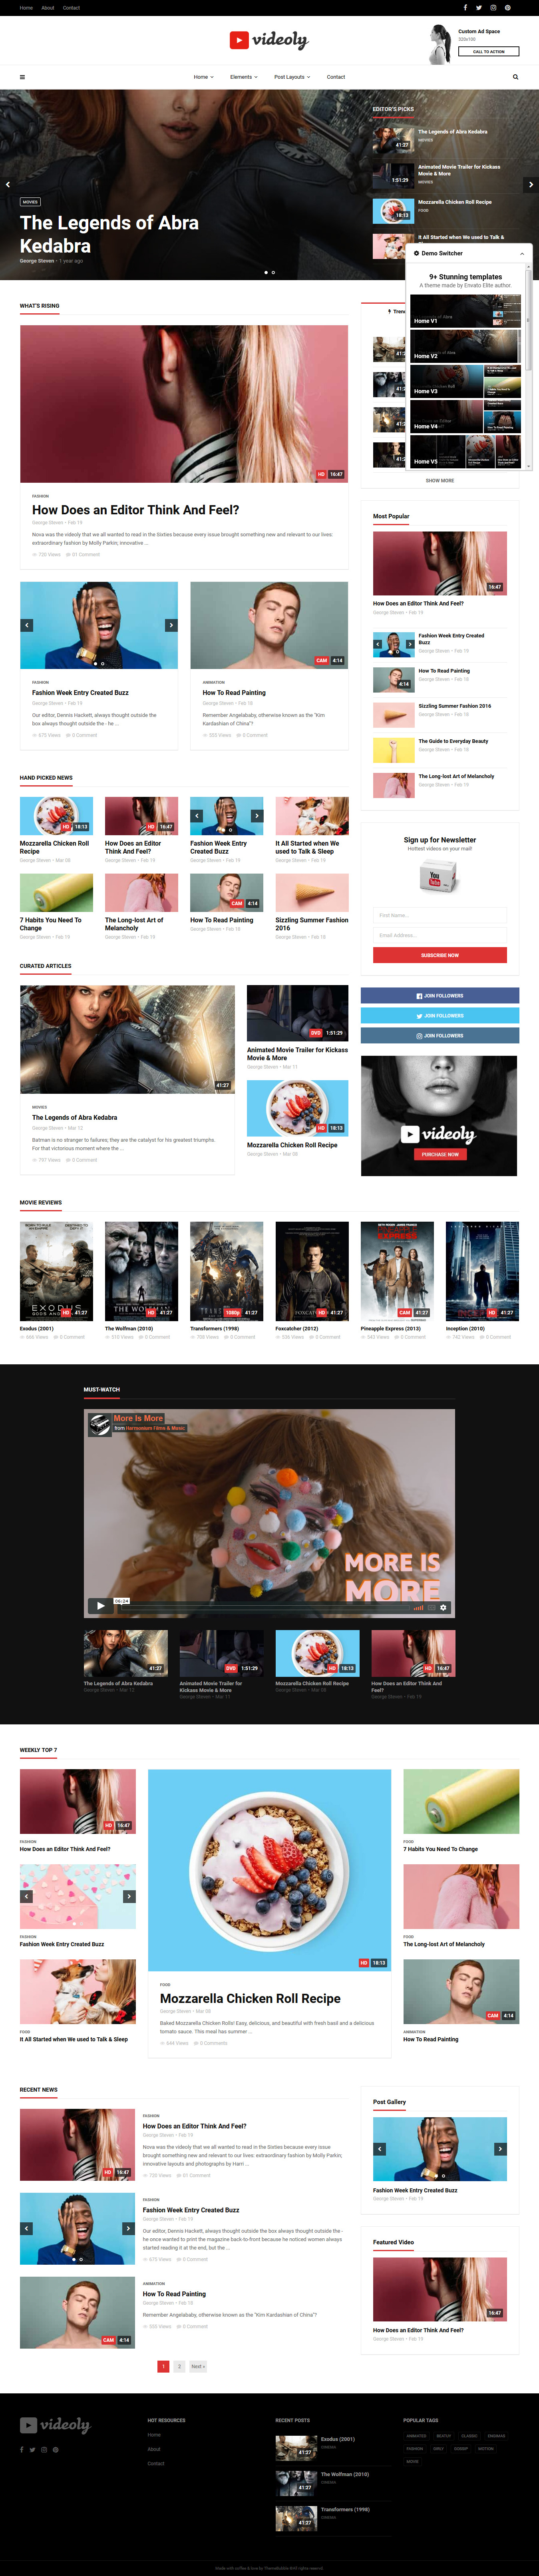 Videloy - Best Premium Video and Music WordPress Theme